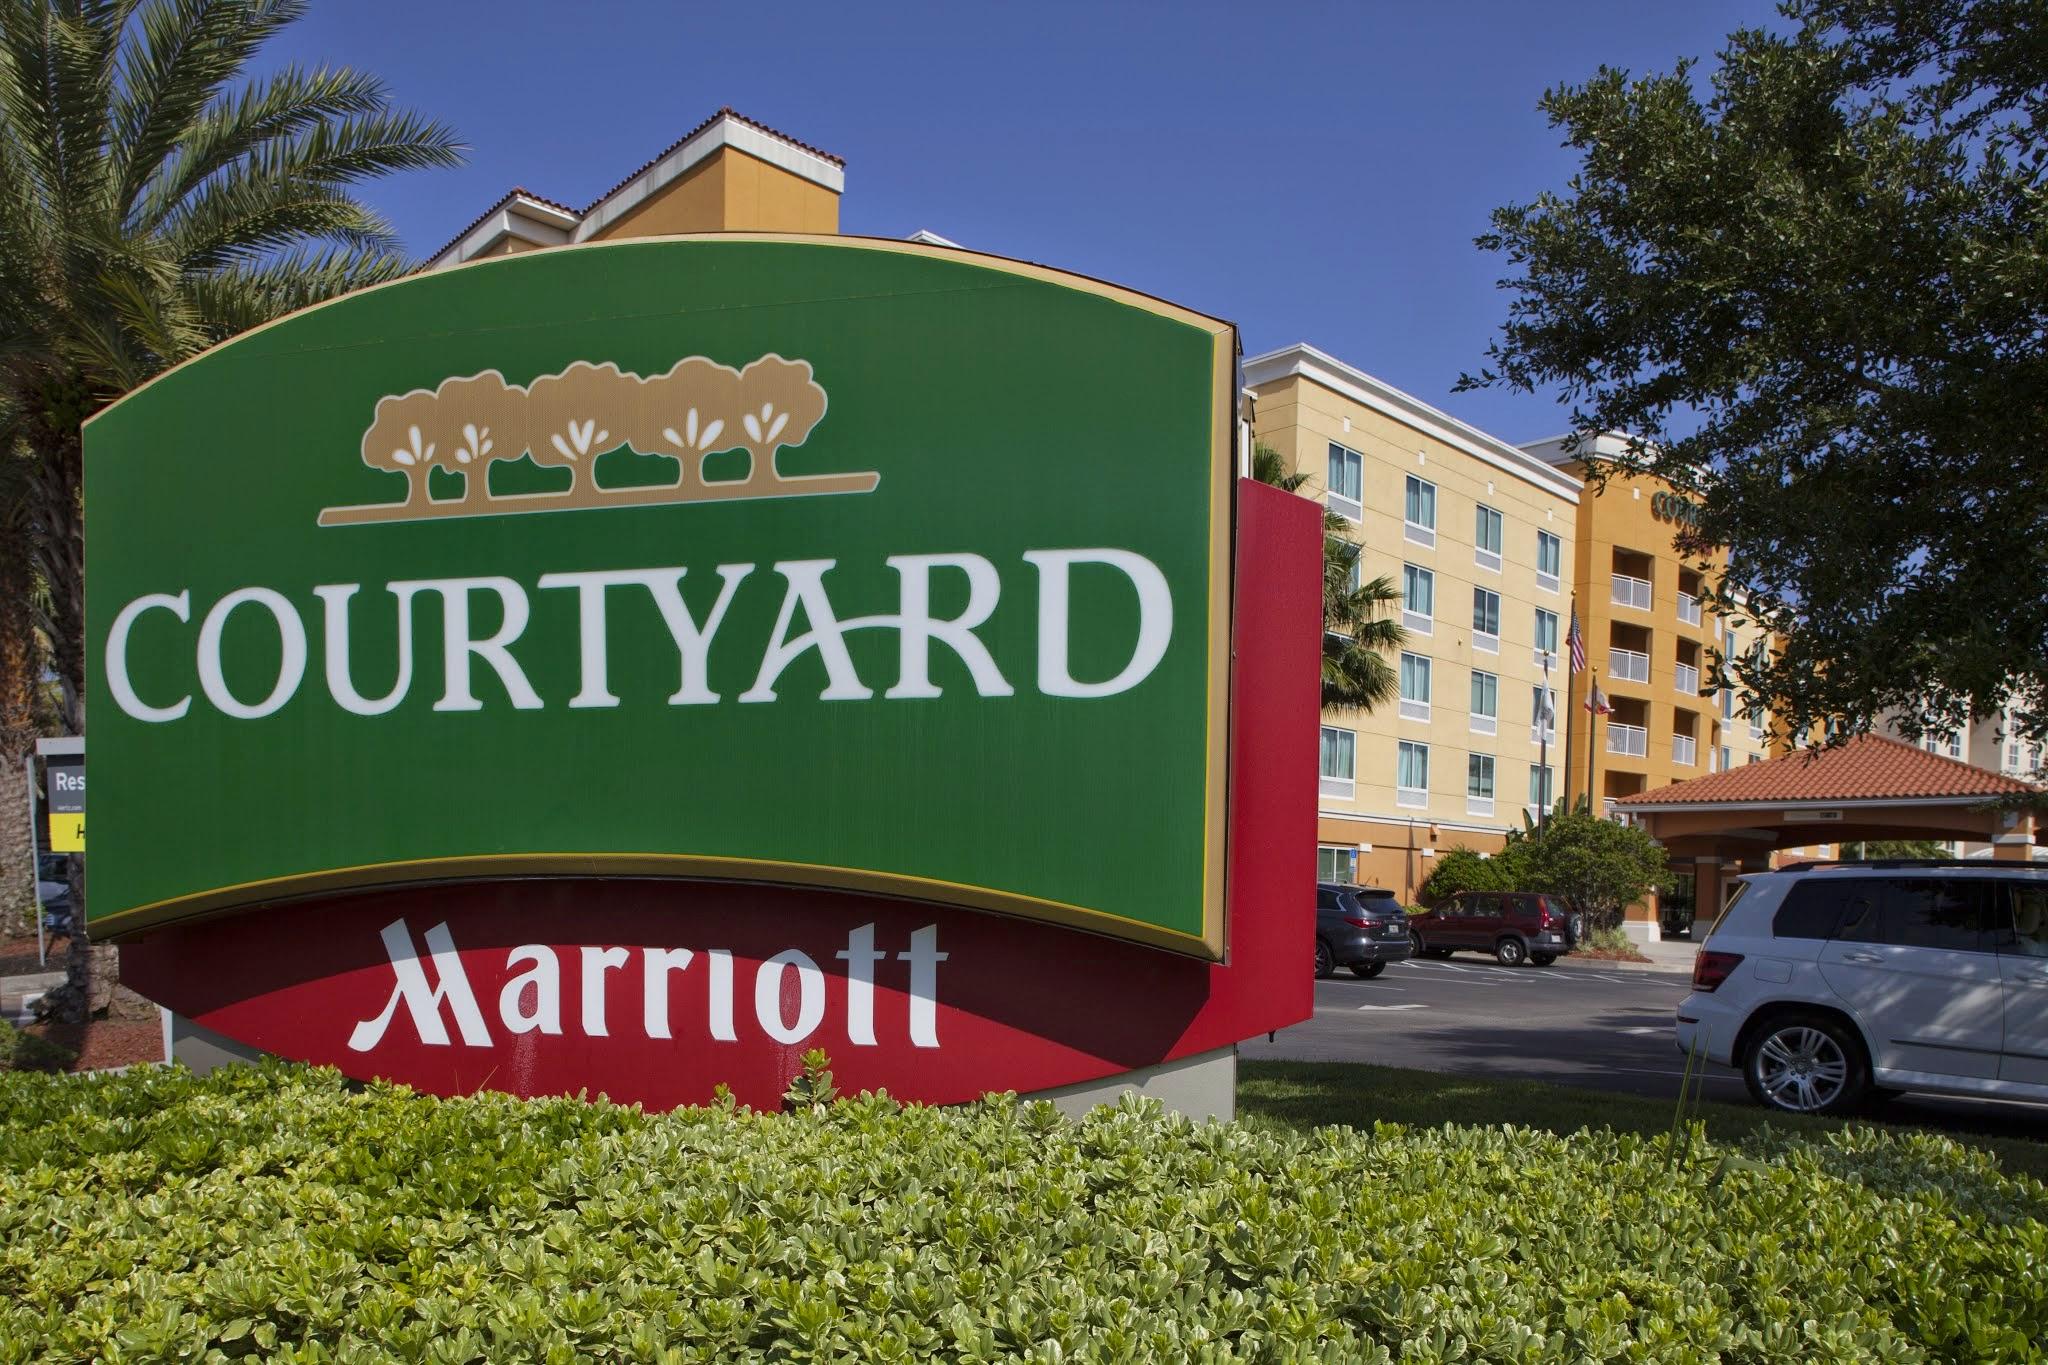 Courtyard by Marriott Jacksonville Orange Park image 3